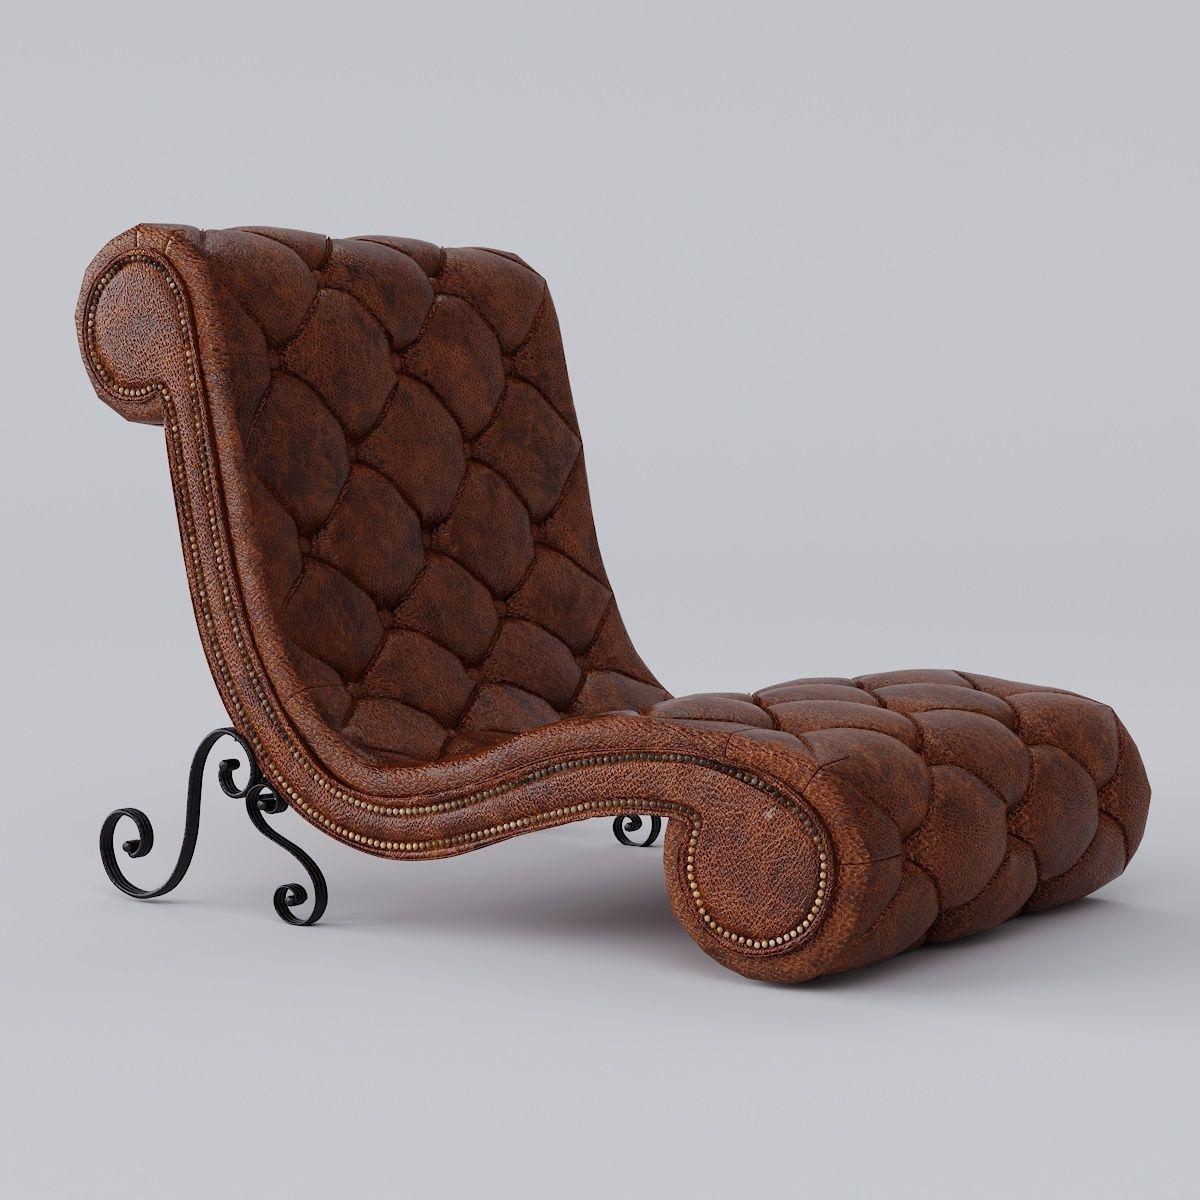 ... Armchair Chaise Lounge Trevi Aico 3d Model Max Obj Mtl Fbx Stl 2 ...